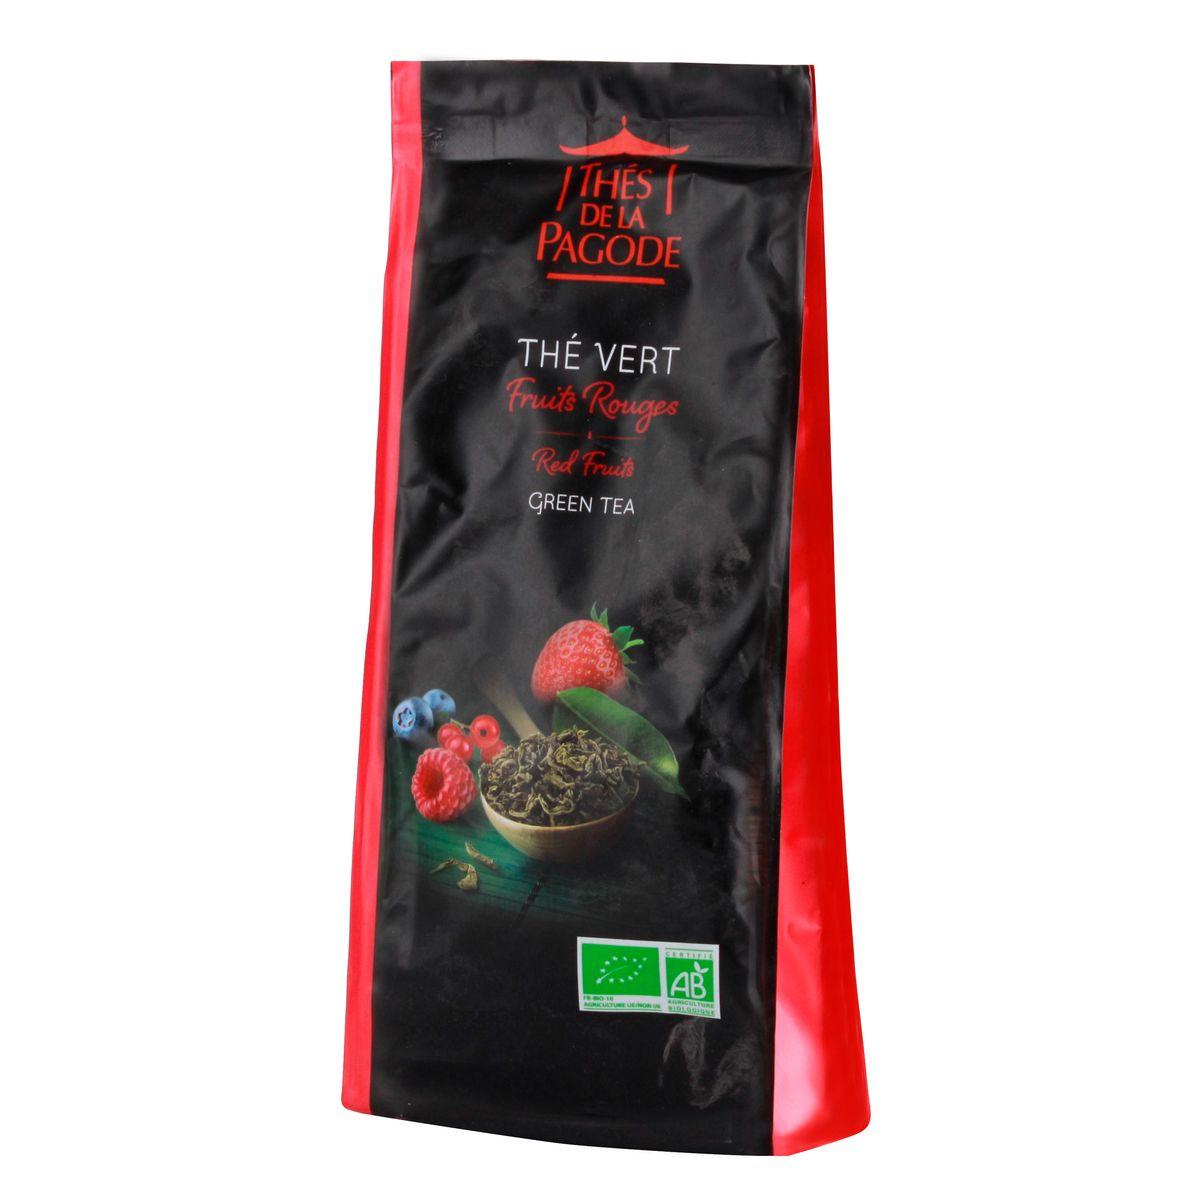 Thé vert fruits rouges bio - Thés de la Pagode